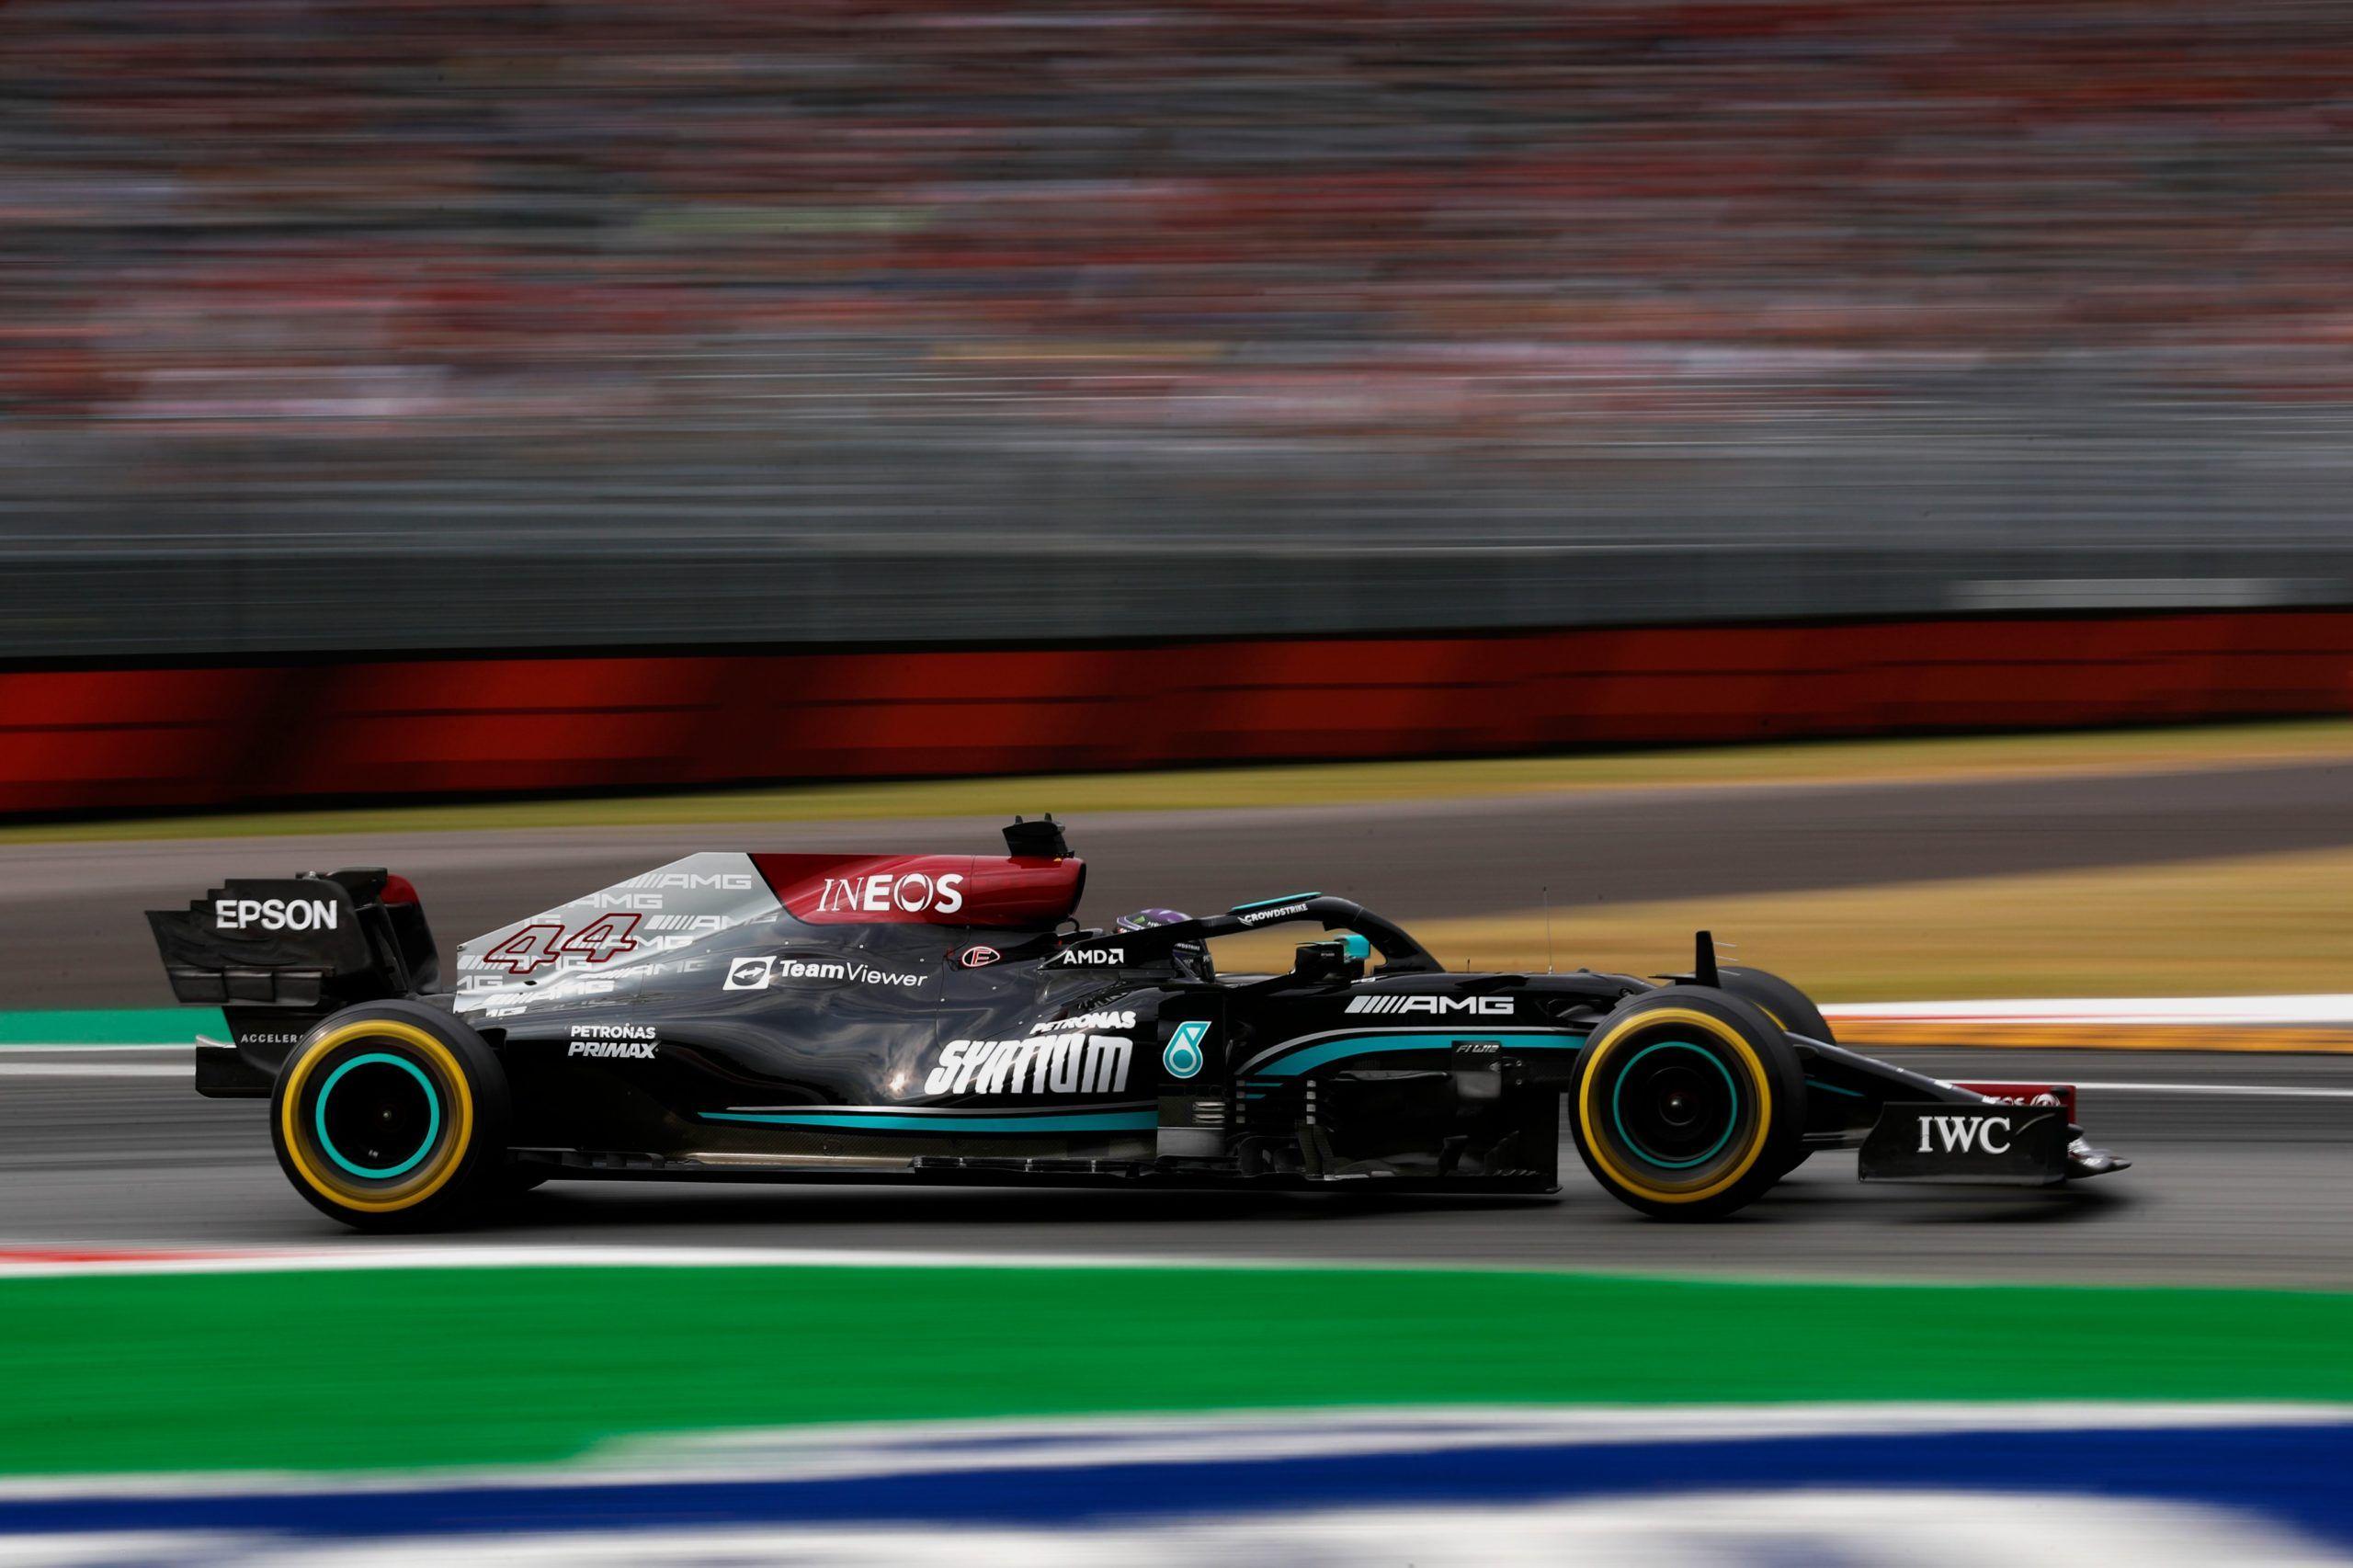 F1, Italian GP